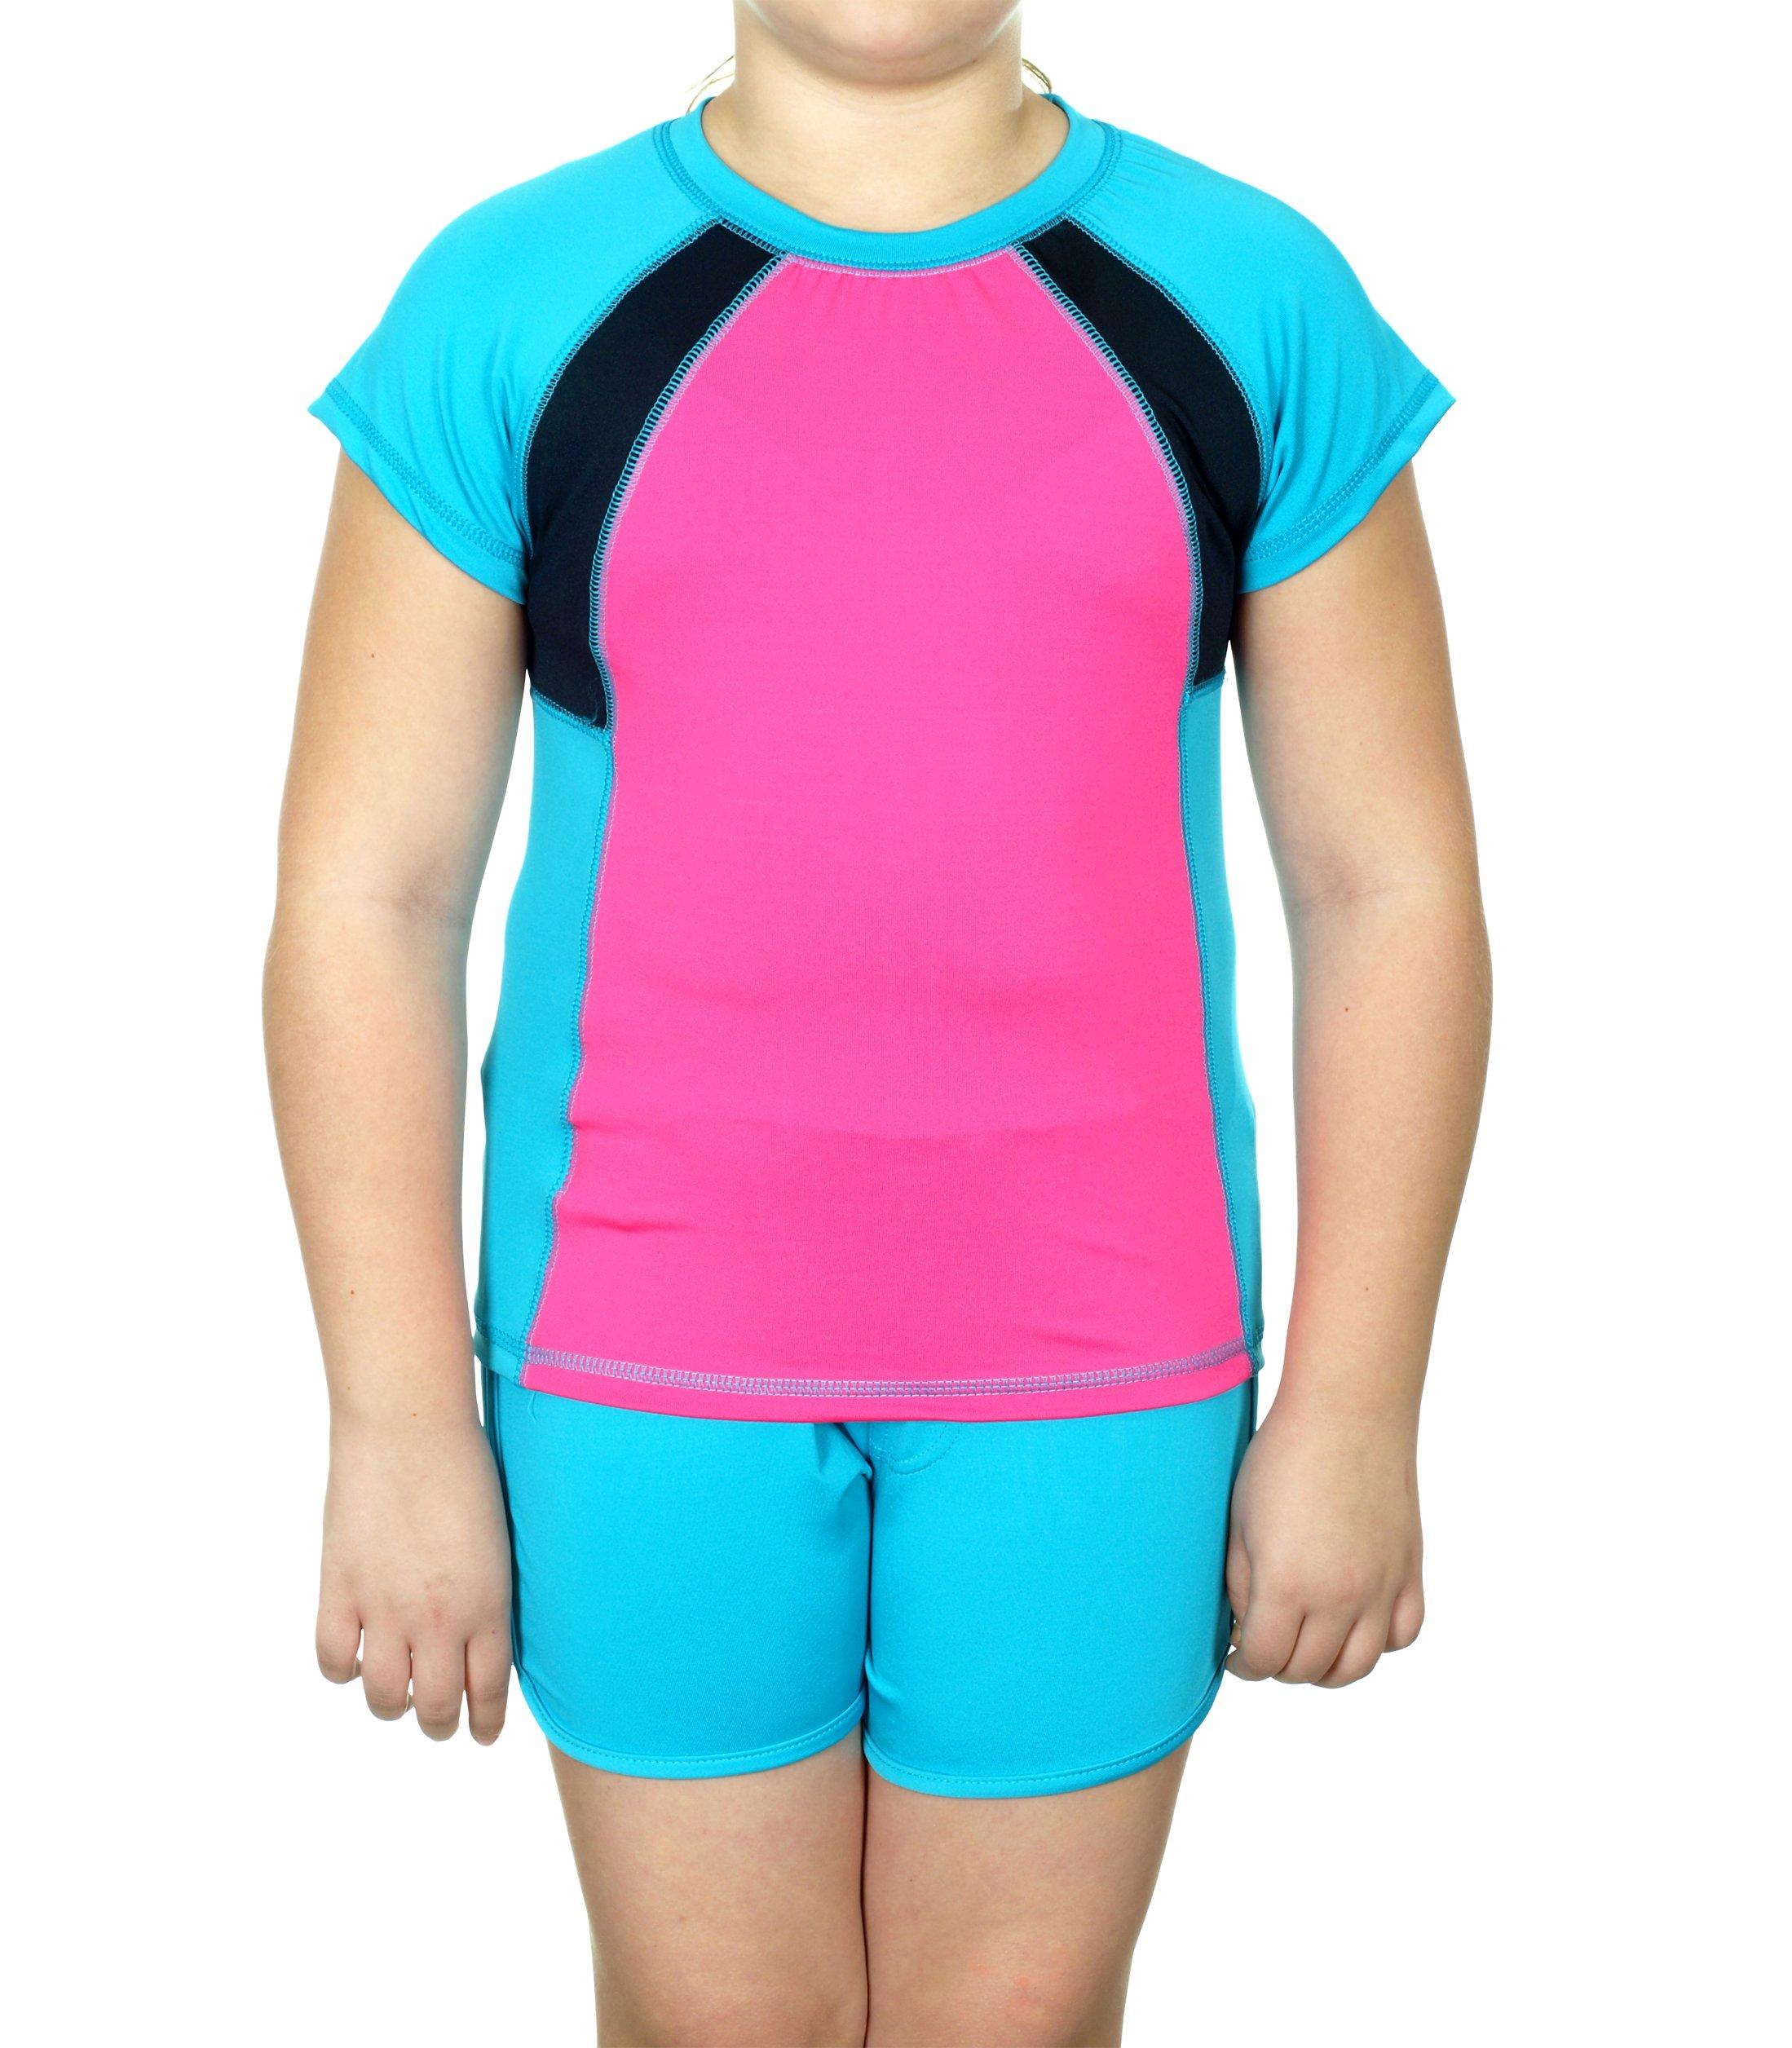 Girls 2-piece Florescent Shirt & Shorts Set (10/12, Aqua & Pink)